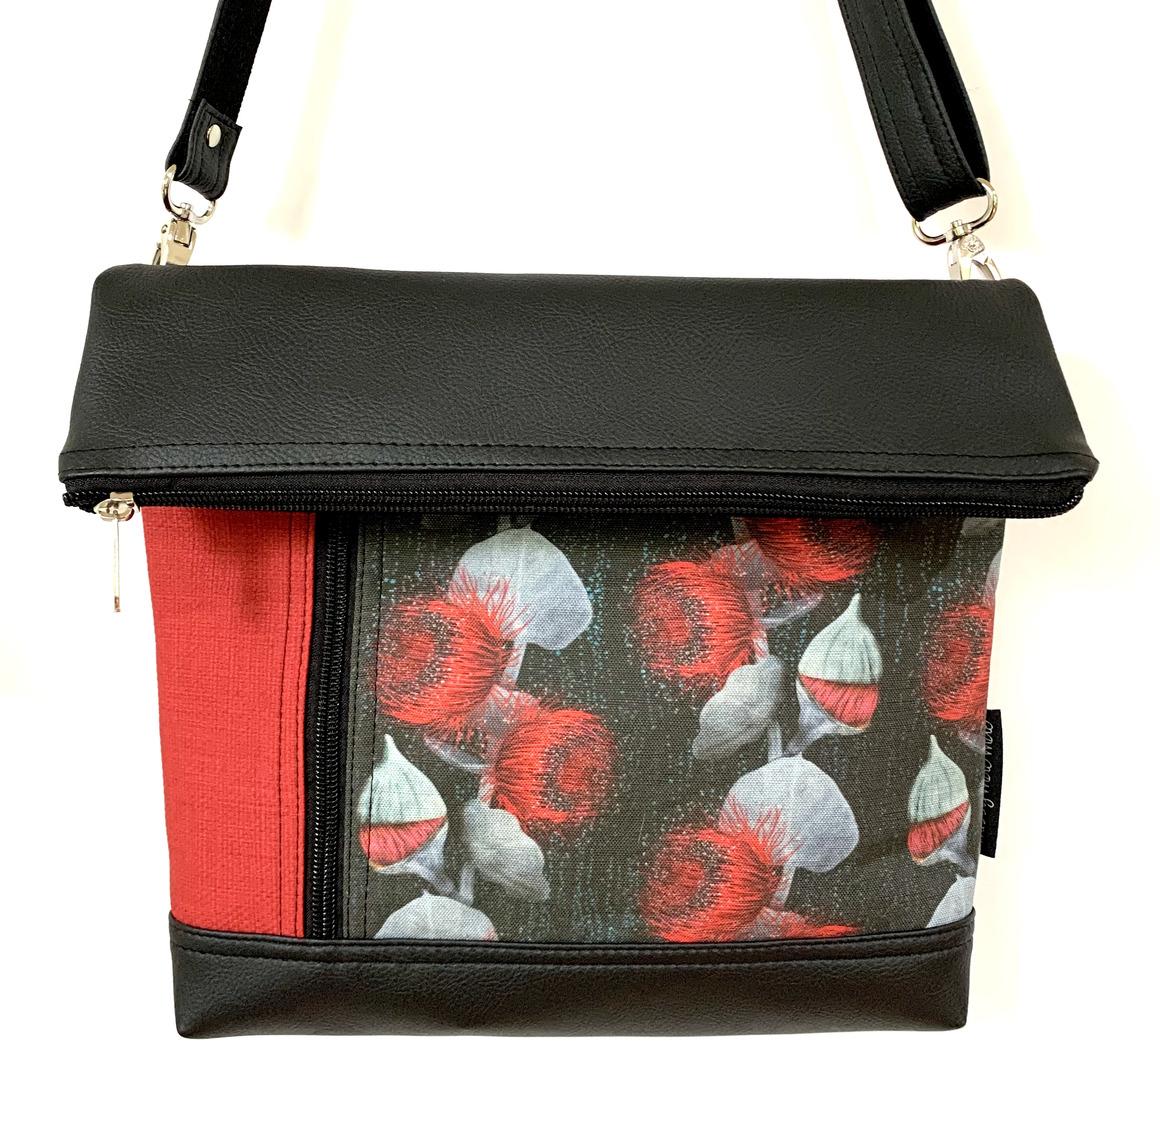 Inge Bag in Red Gum Flower | Trada Marketplace